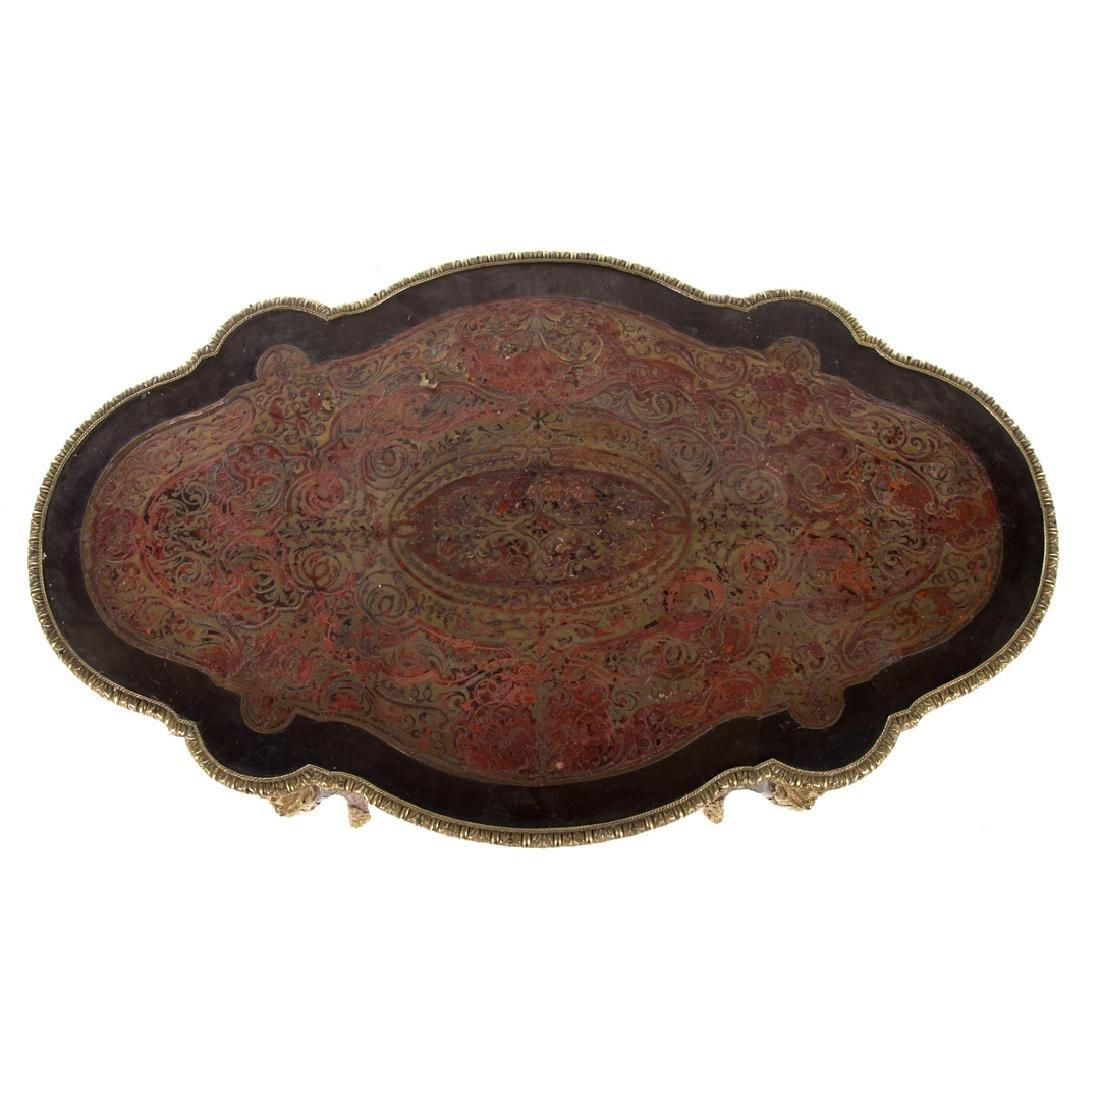 Napoleon III Louis XIV style Boulle table du salon - 3